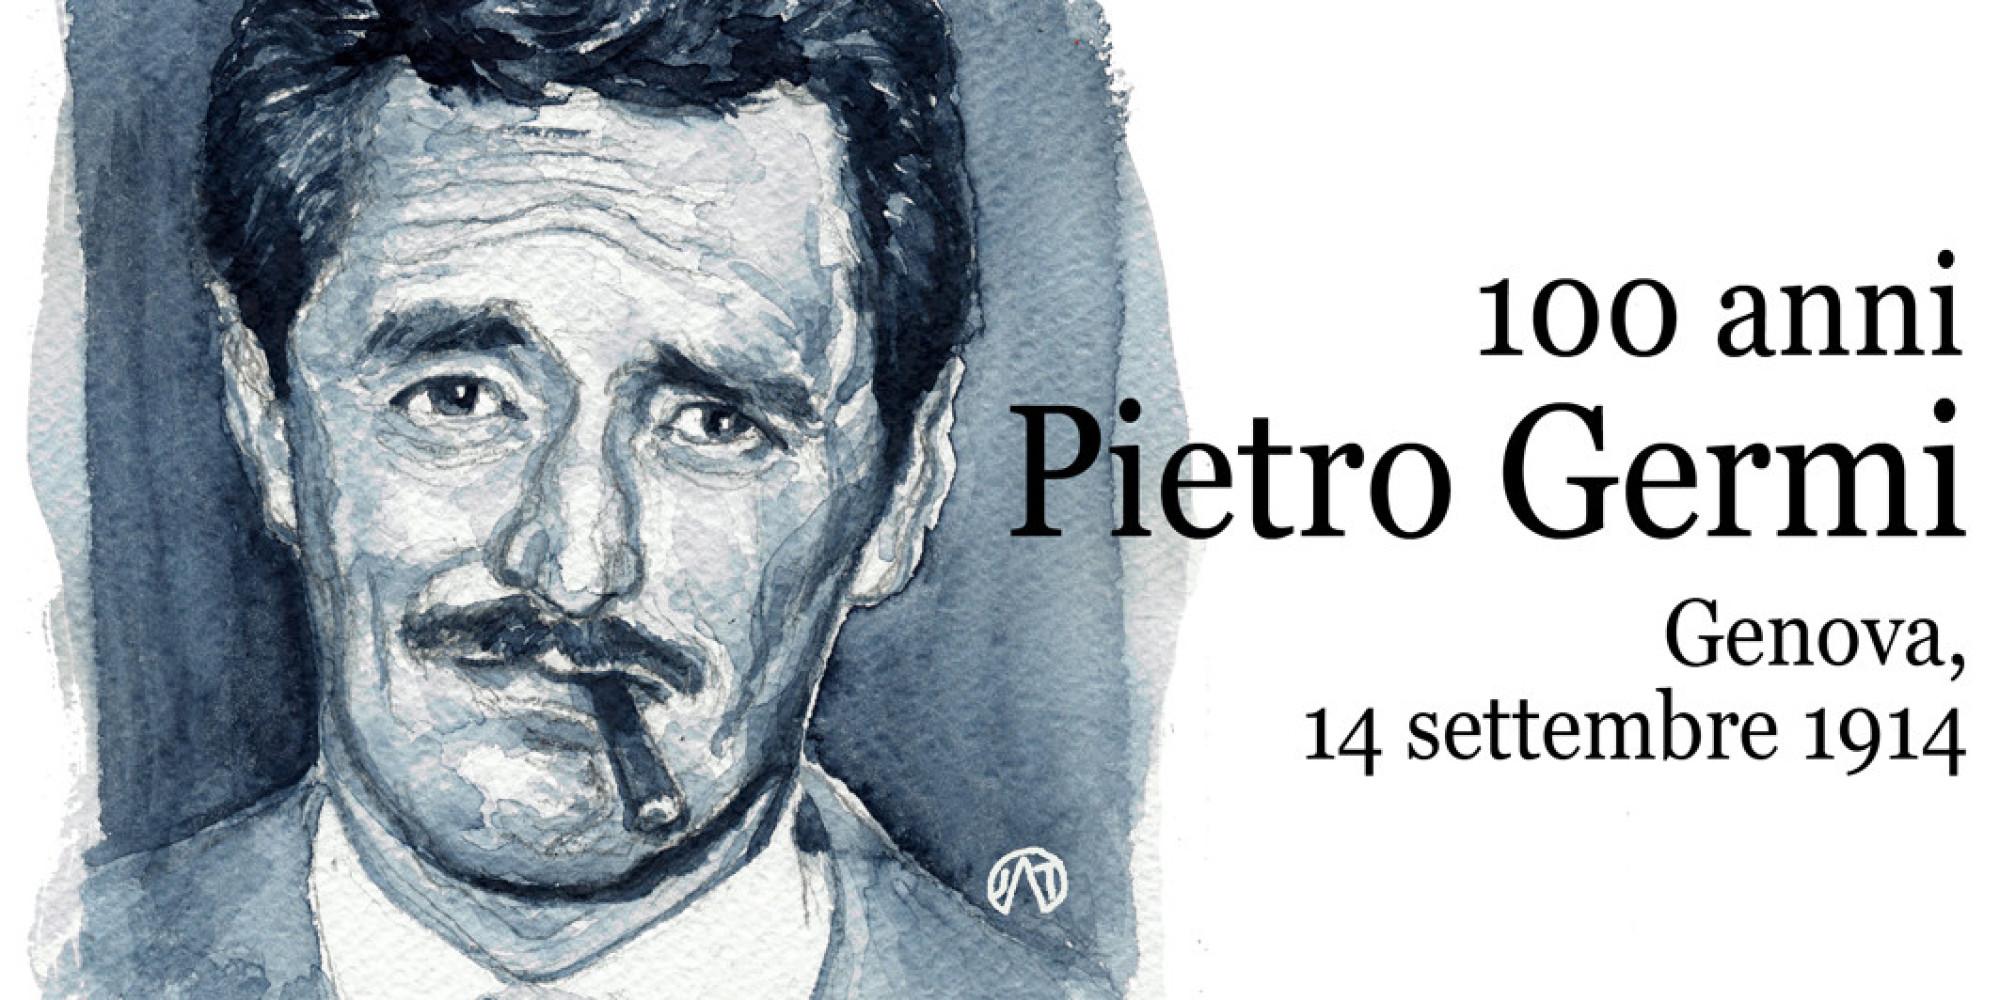 Pietro-germi-facebook